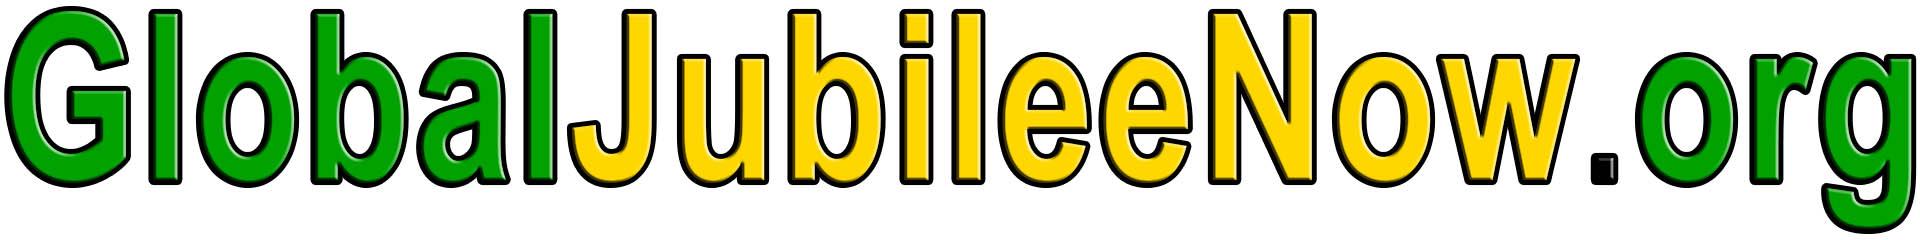 Global Jubilee Now